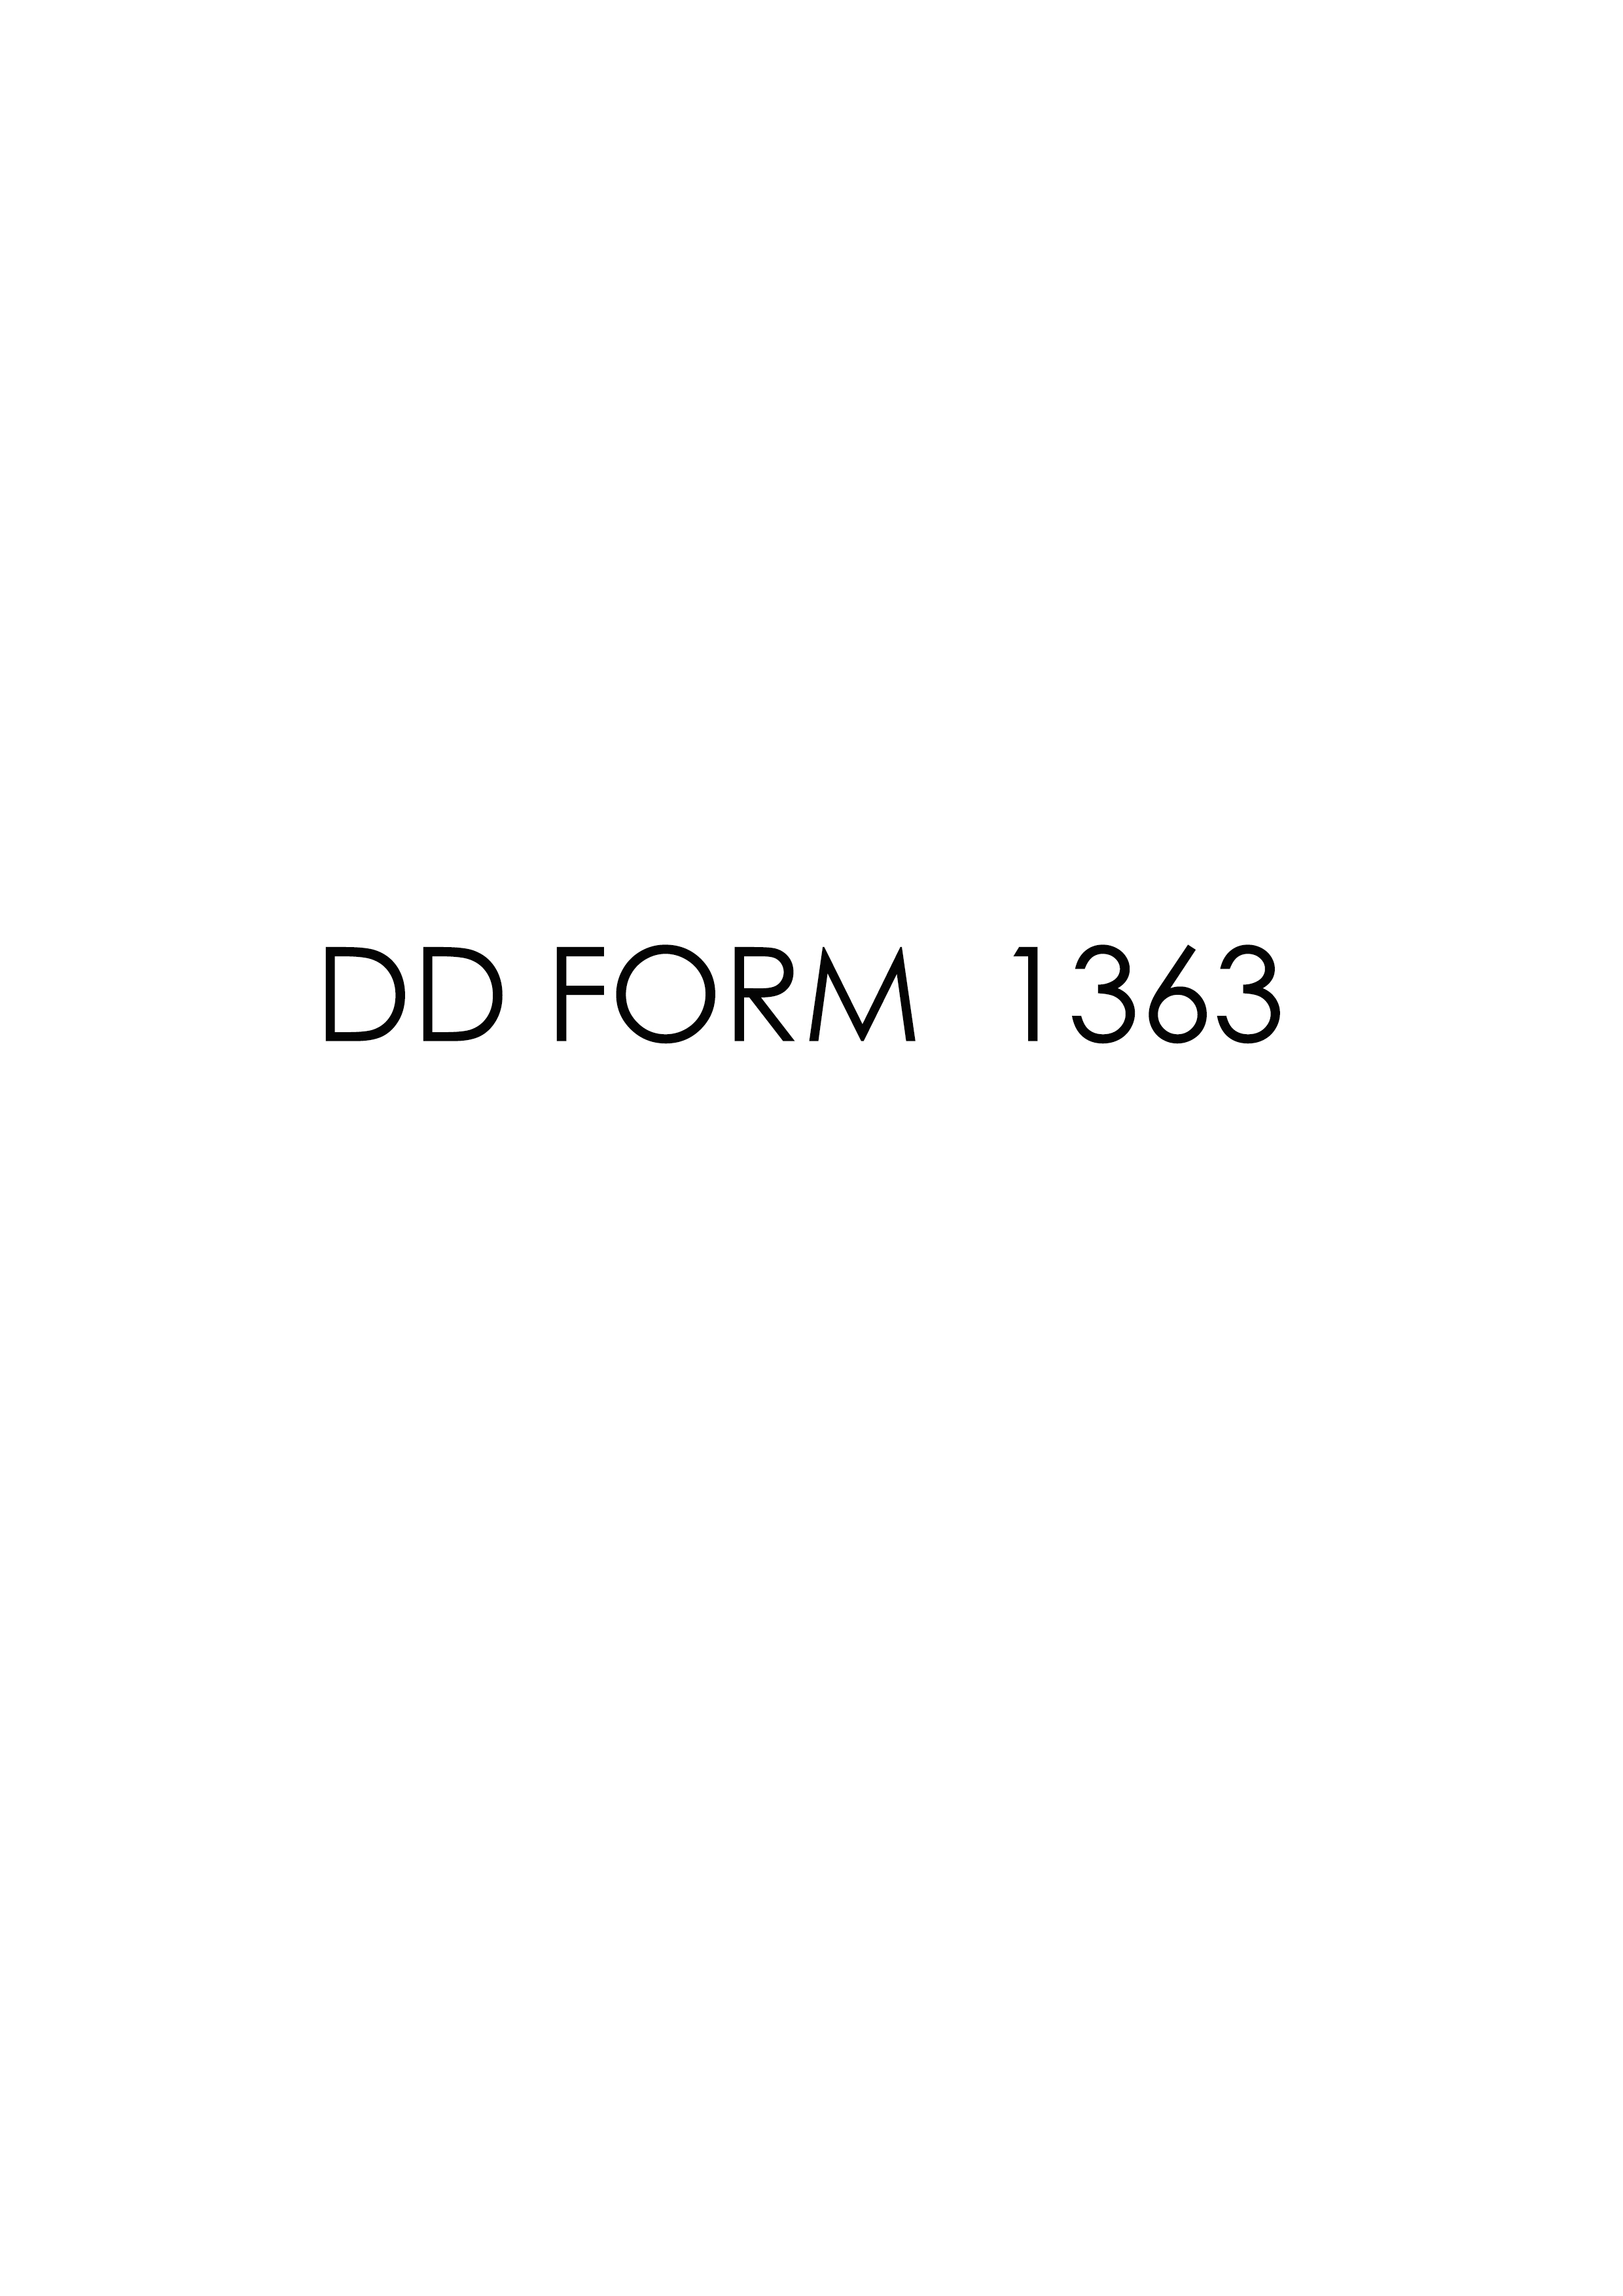 Download dd Form 1363 Free